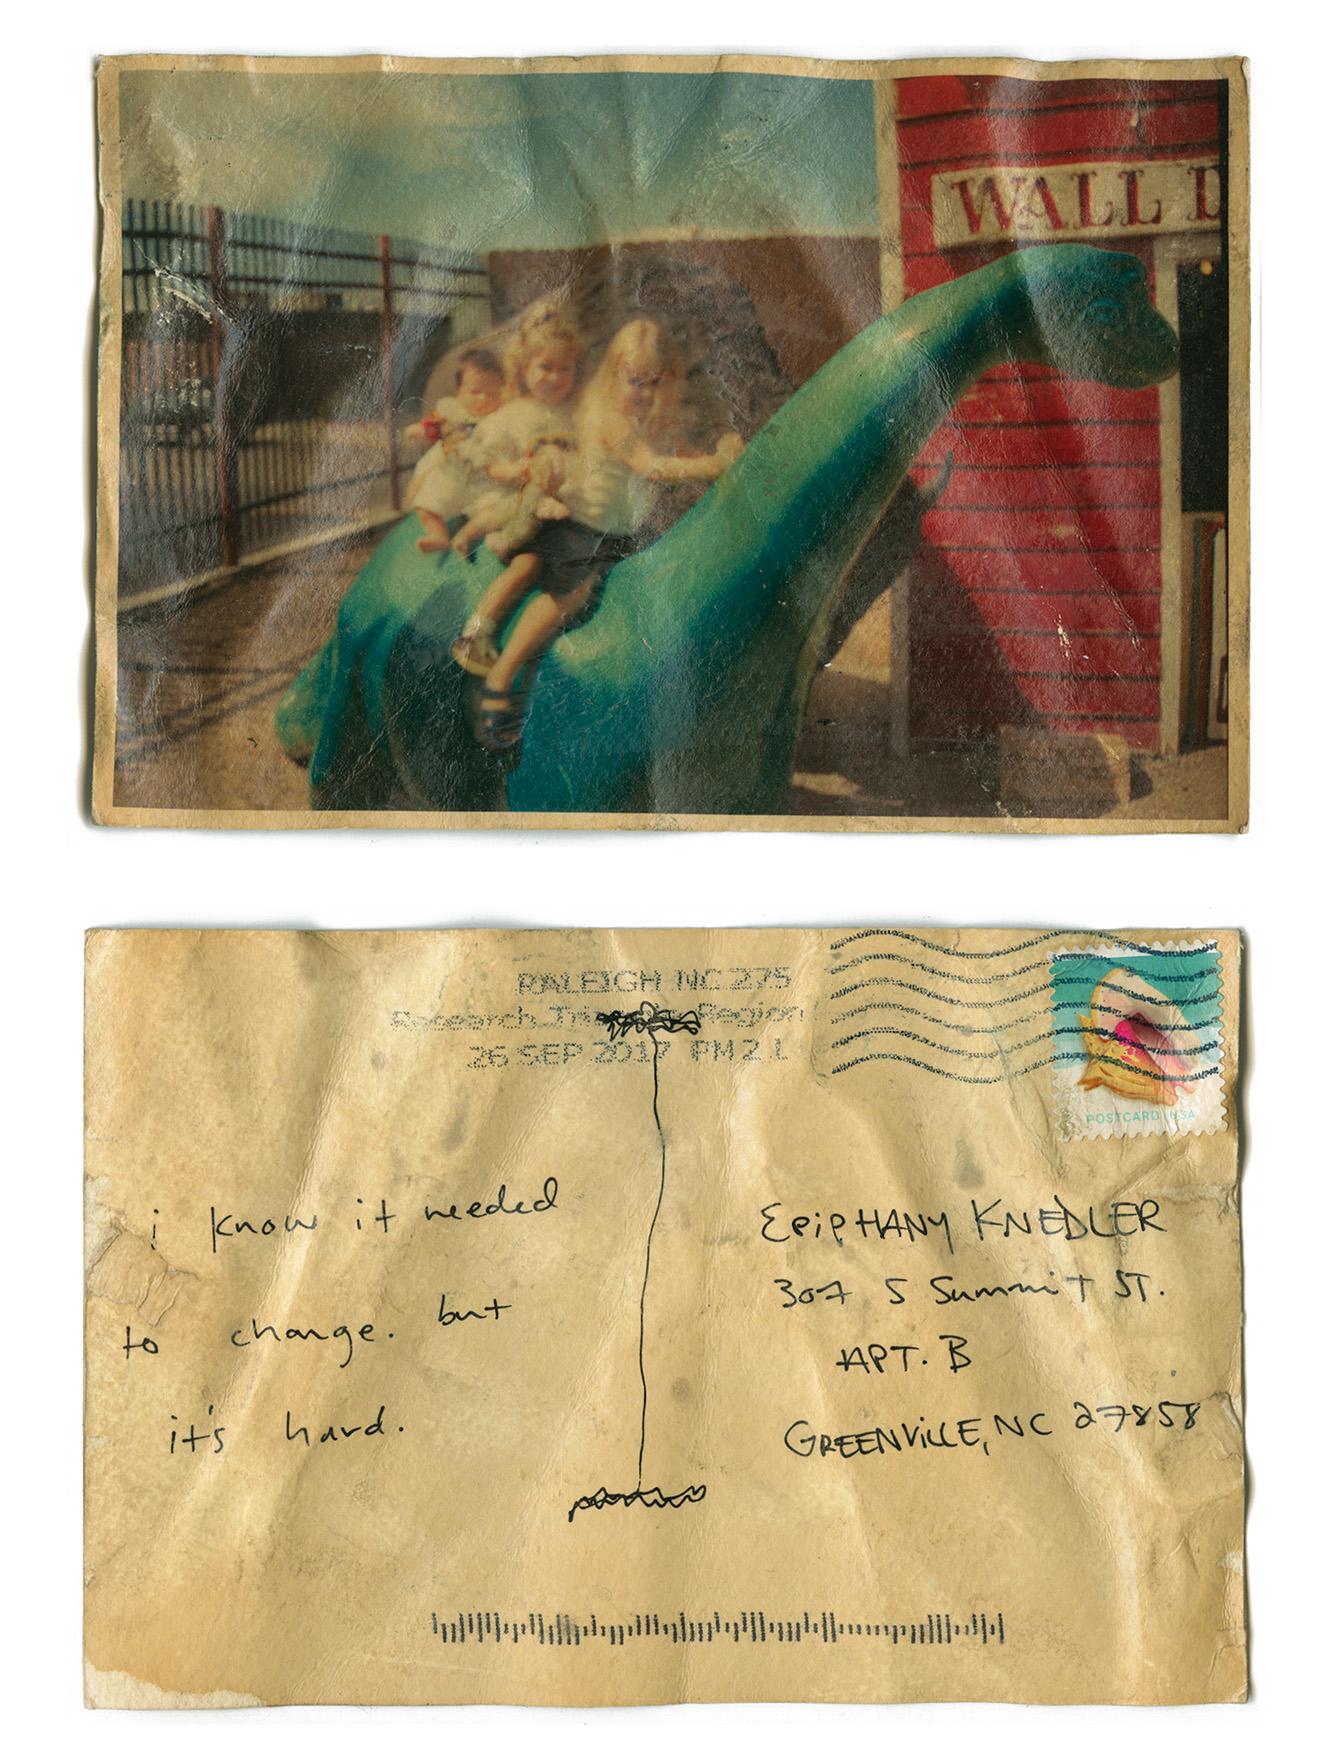 Postcard #3